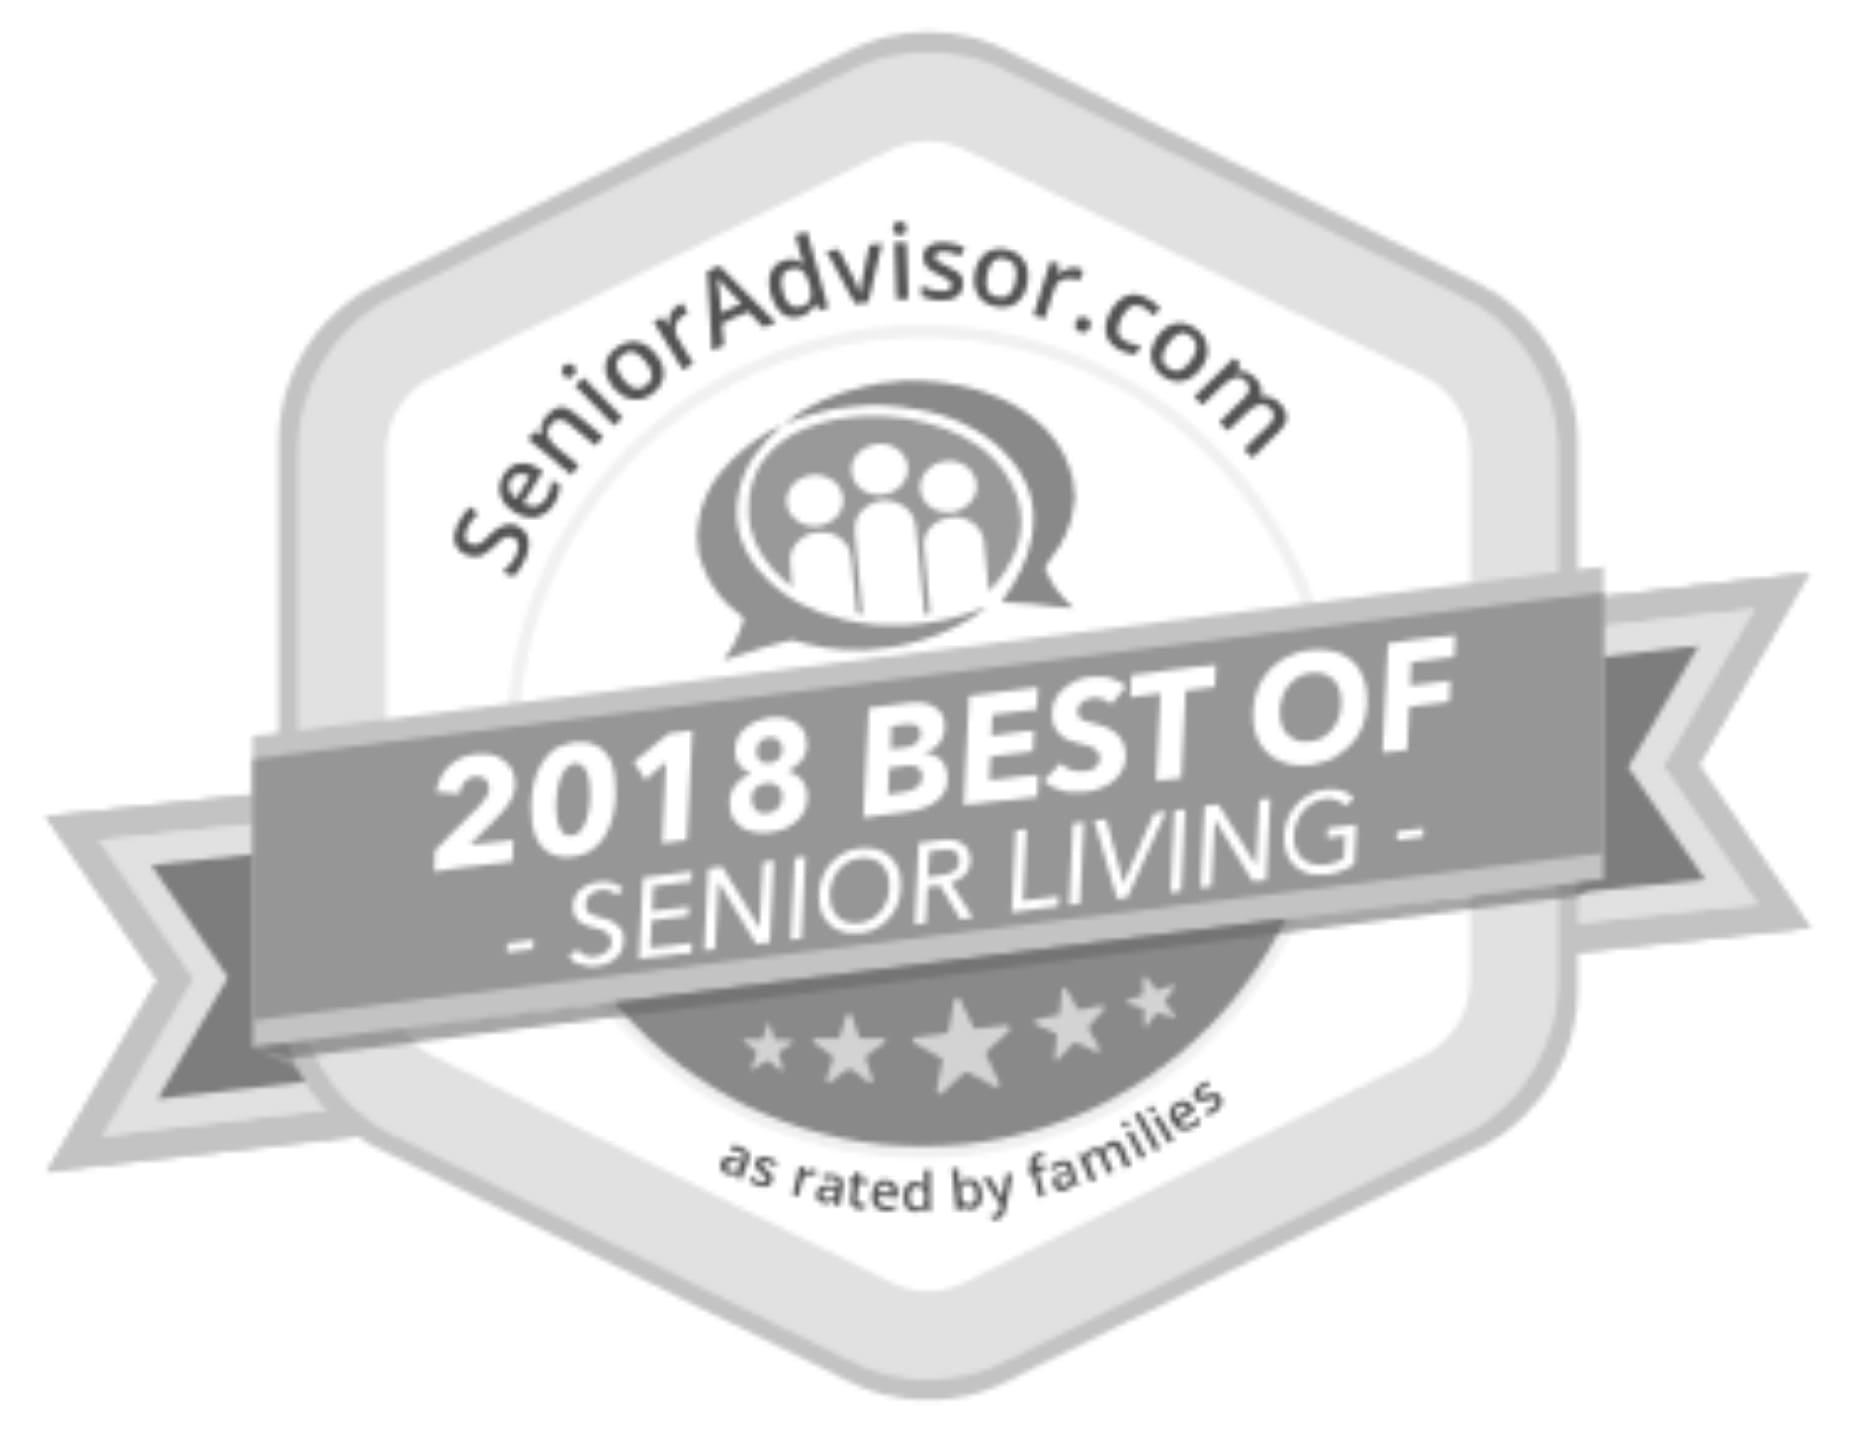 Top-Rated Senior Care Providers by senioradvisor.com